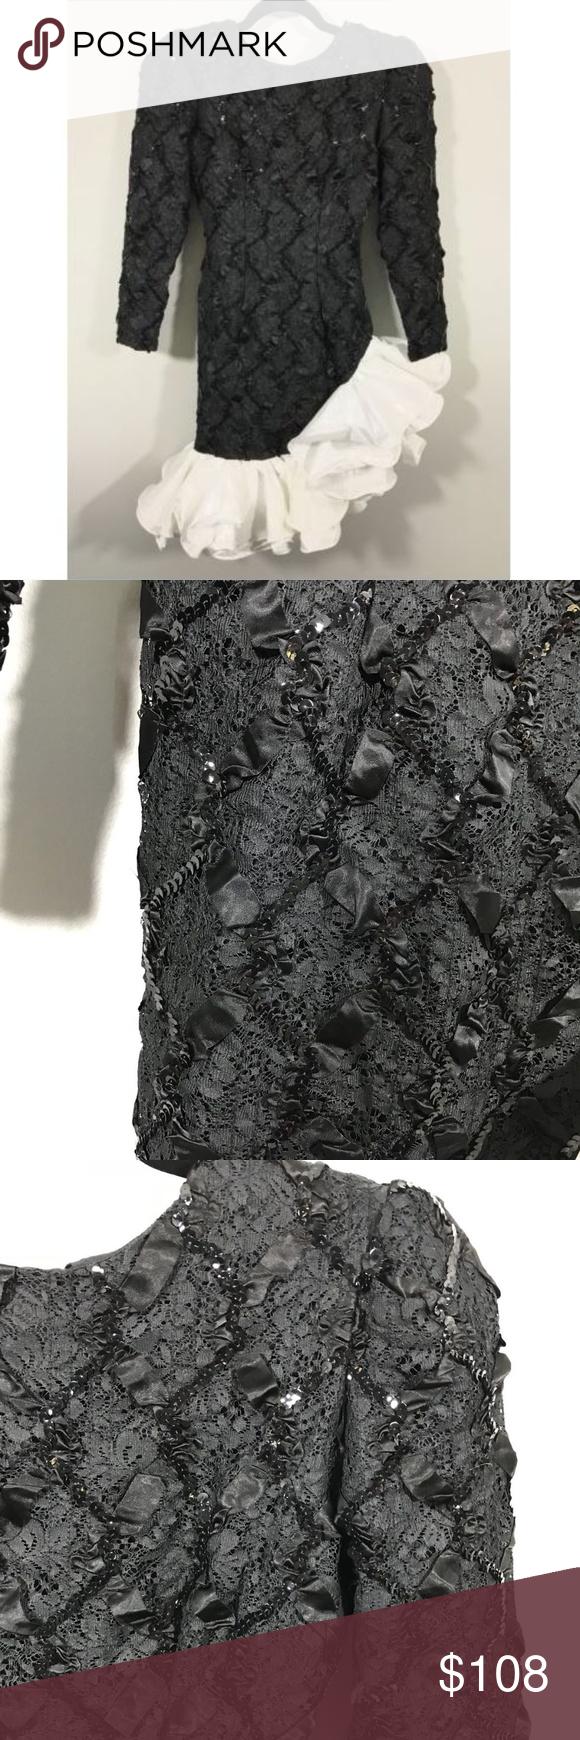 Vtg s prom dress dave u johnny size small black ud pit to pit